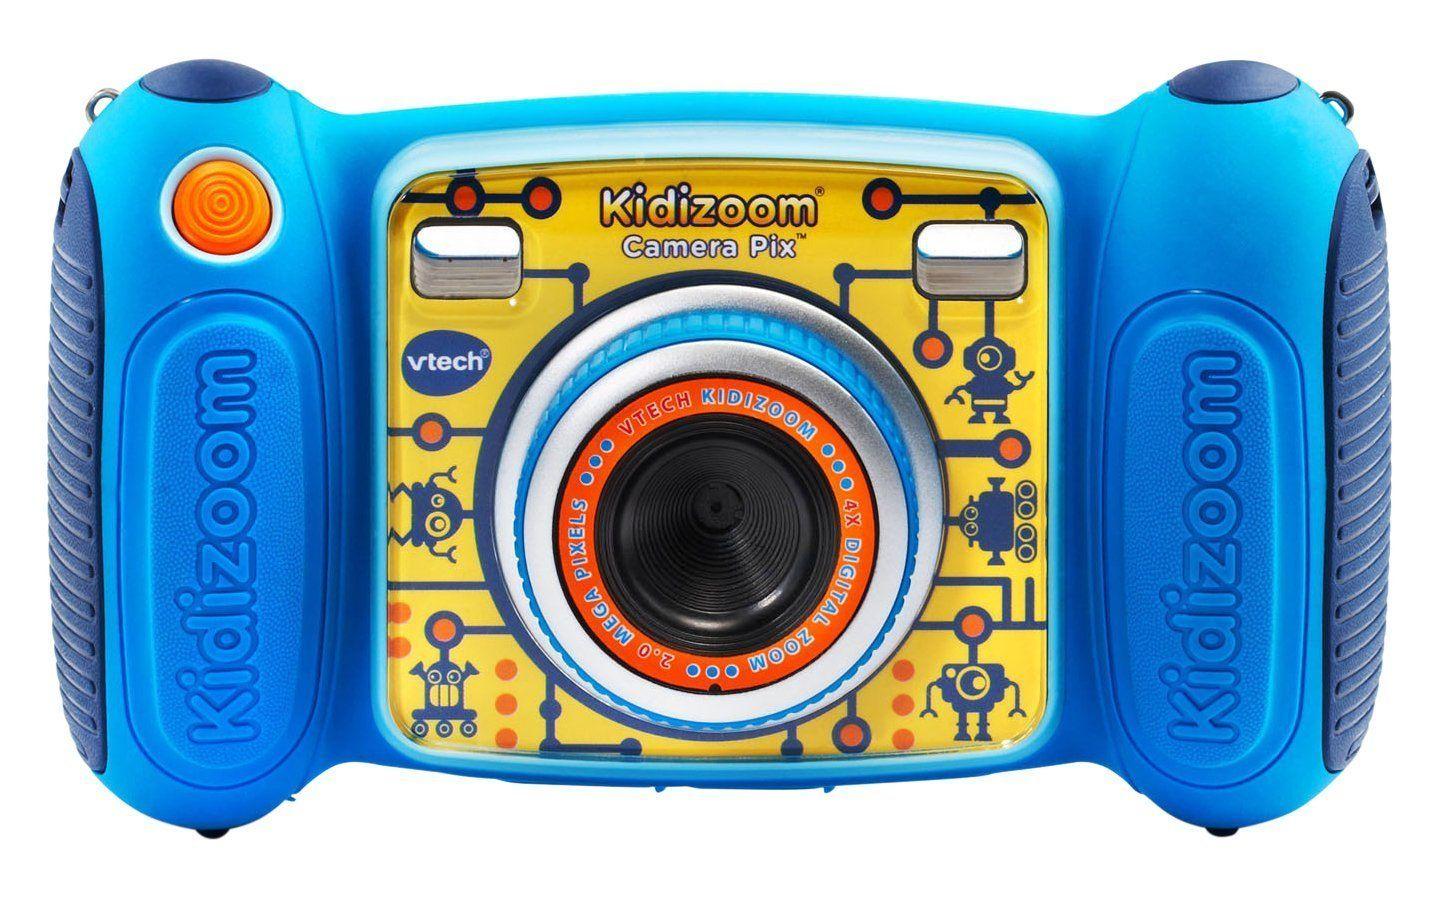 Amazon Com Vtech Kidizoom Camera Pix Blue Toys Games With Images Kids Camera Digital Camera Camera